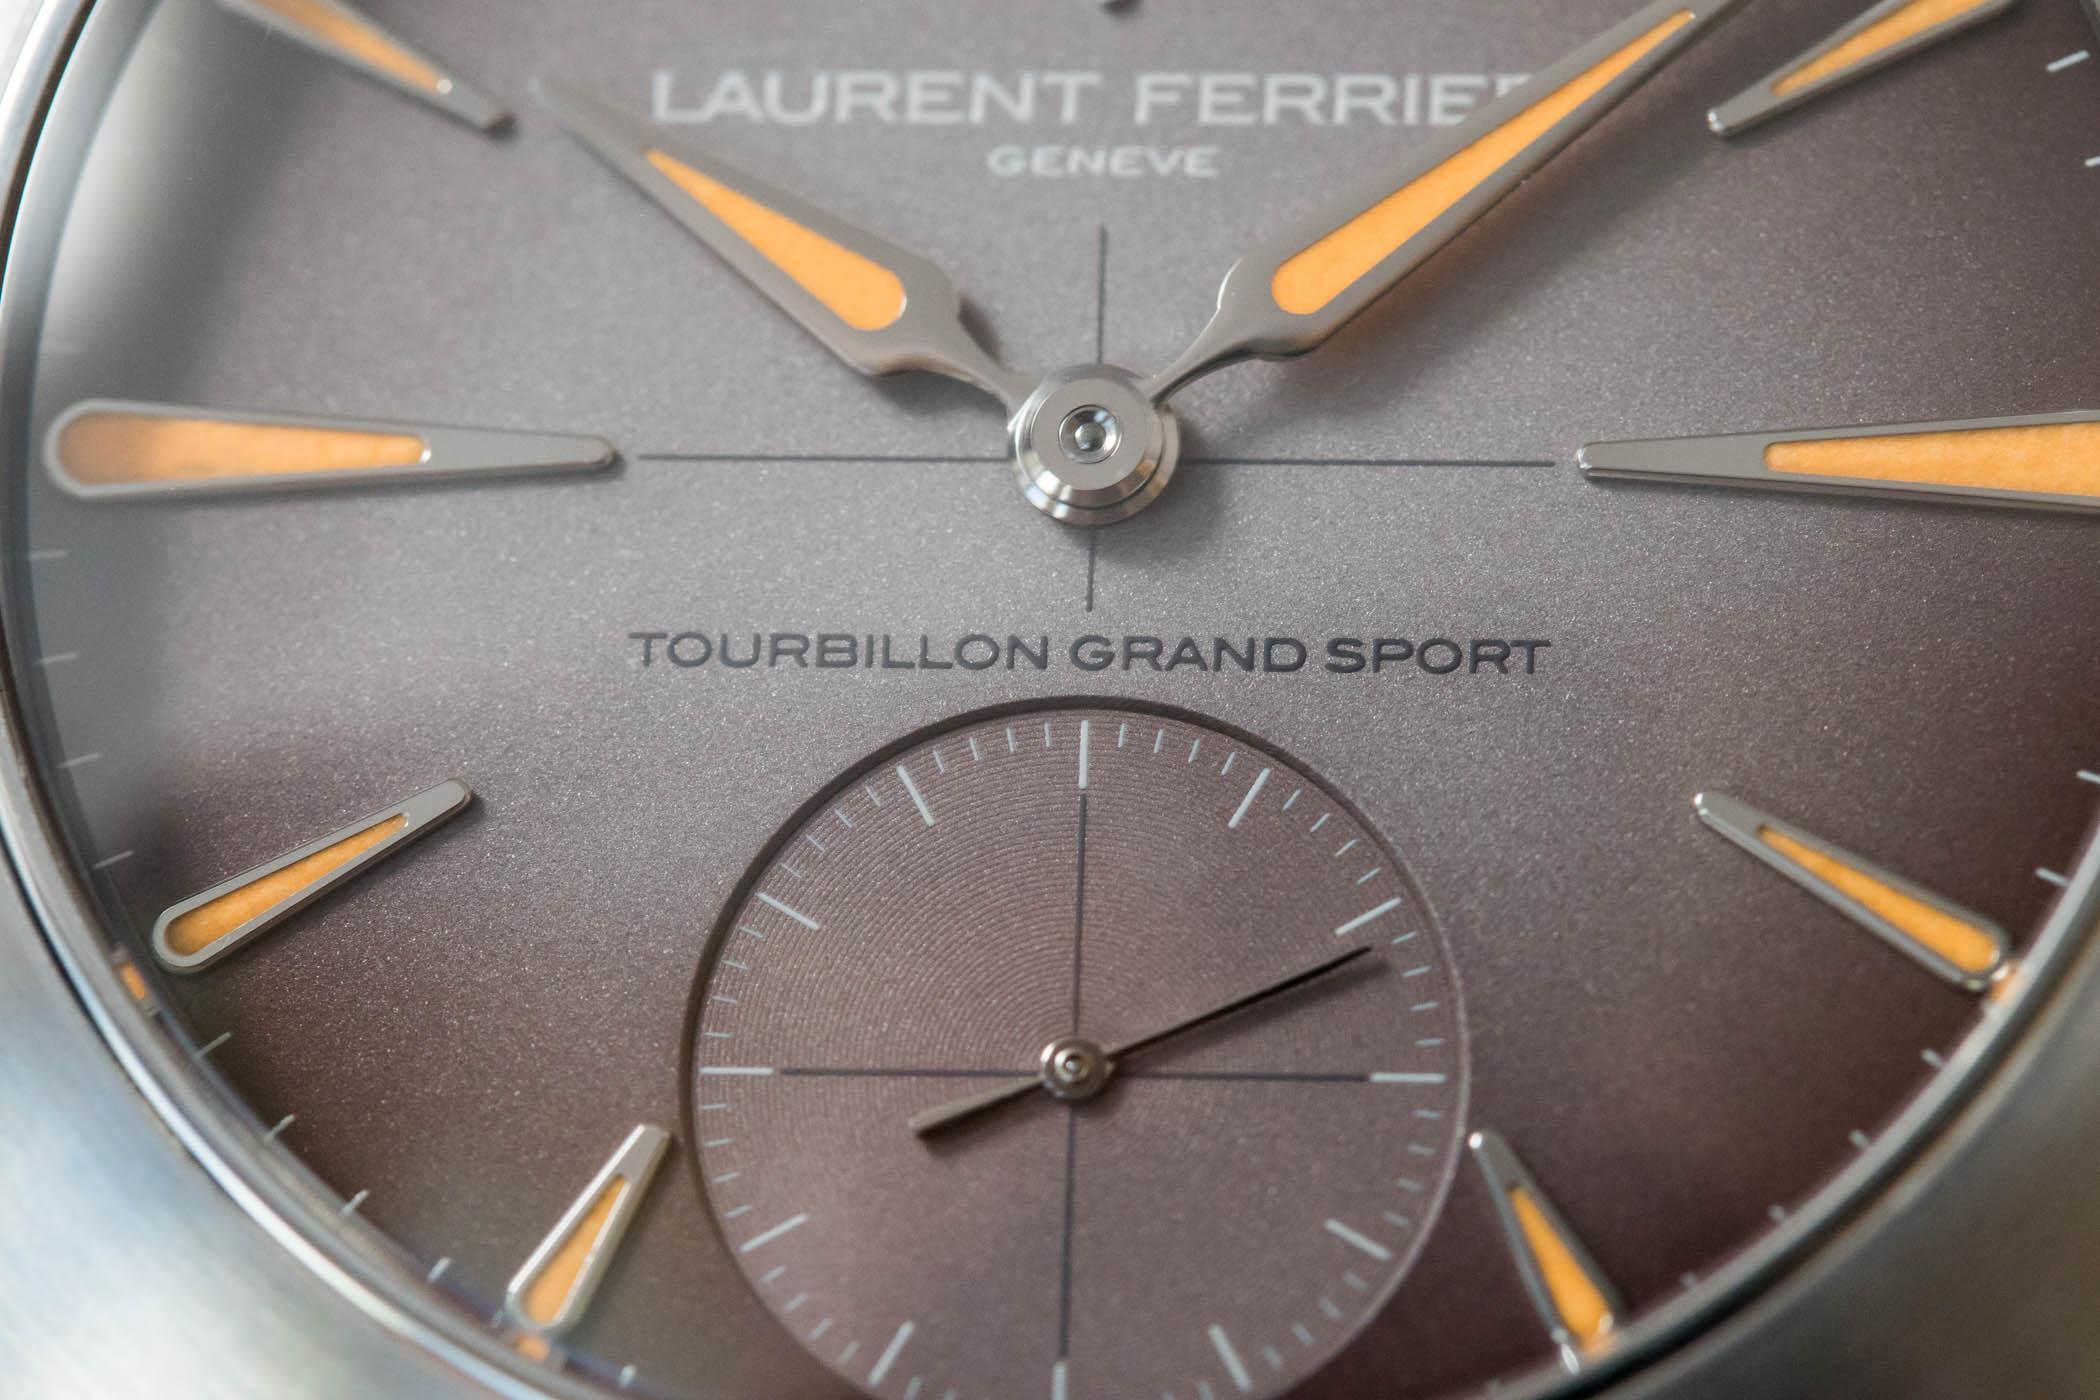 Laurent Ferrier Tourbillon Grand Sport - Steel Luxury Sports Watch - 14